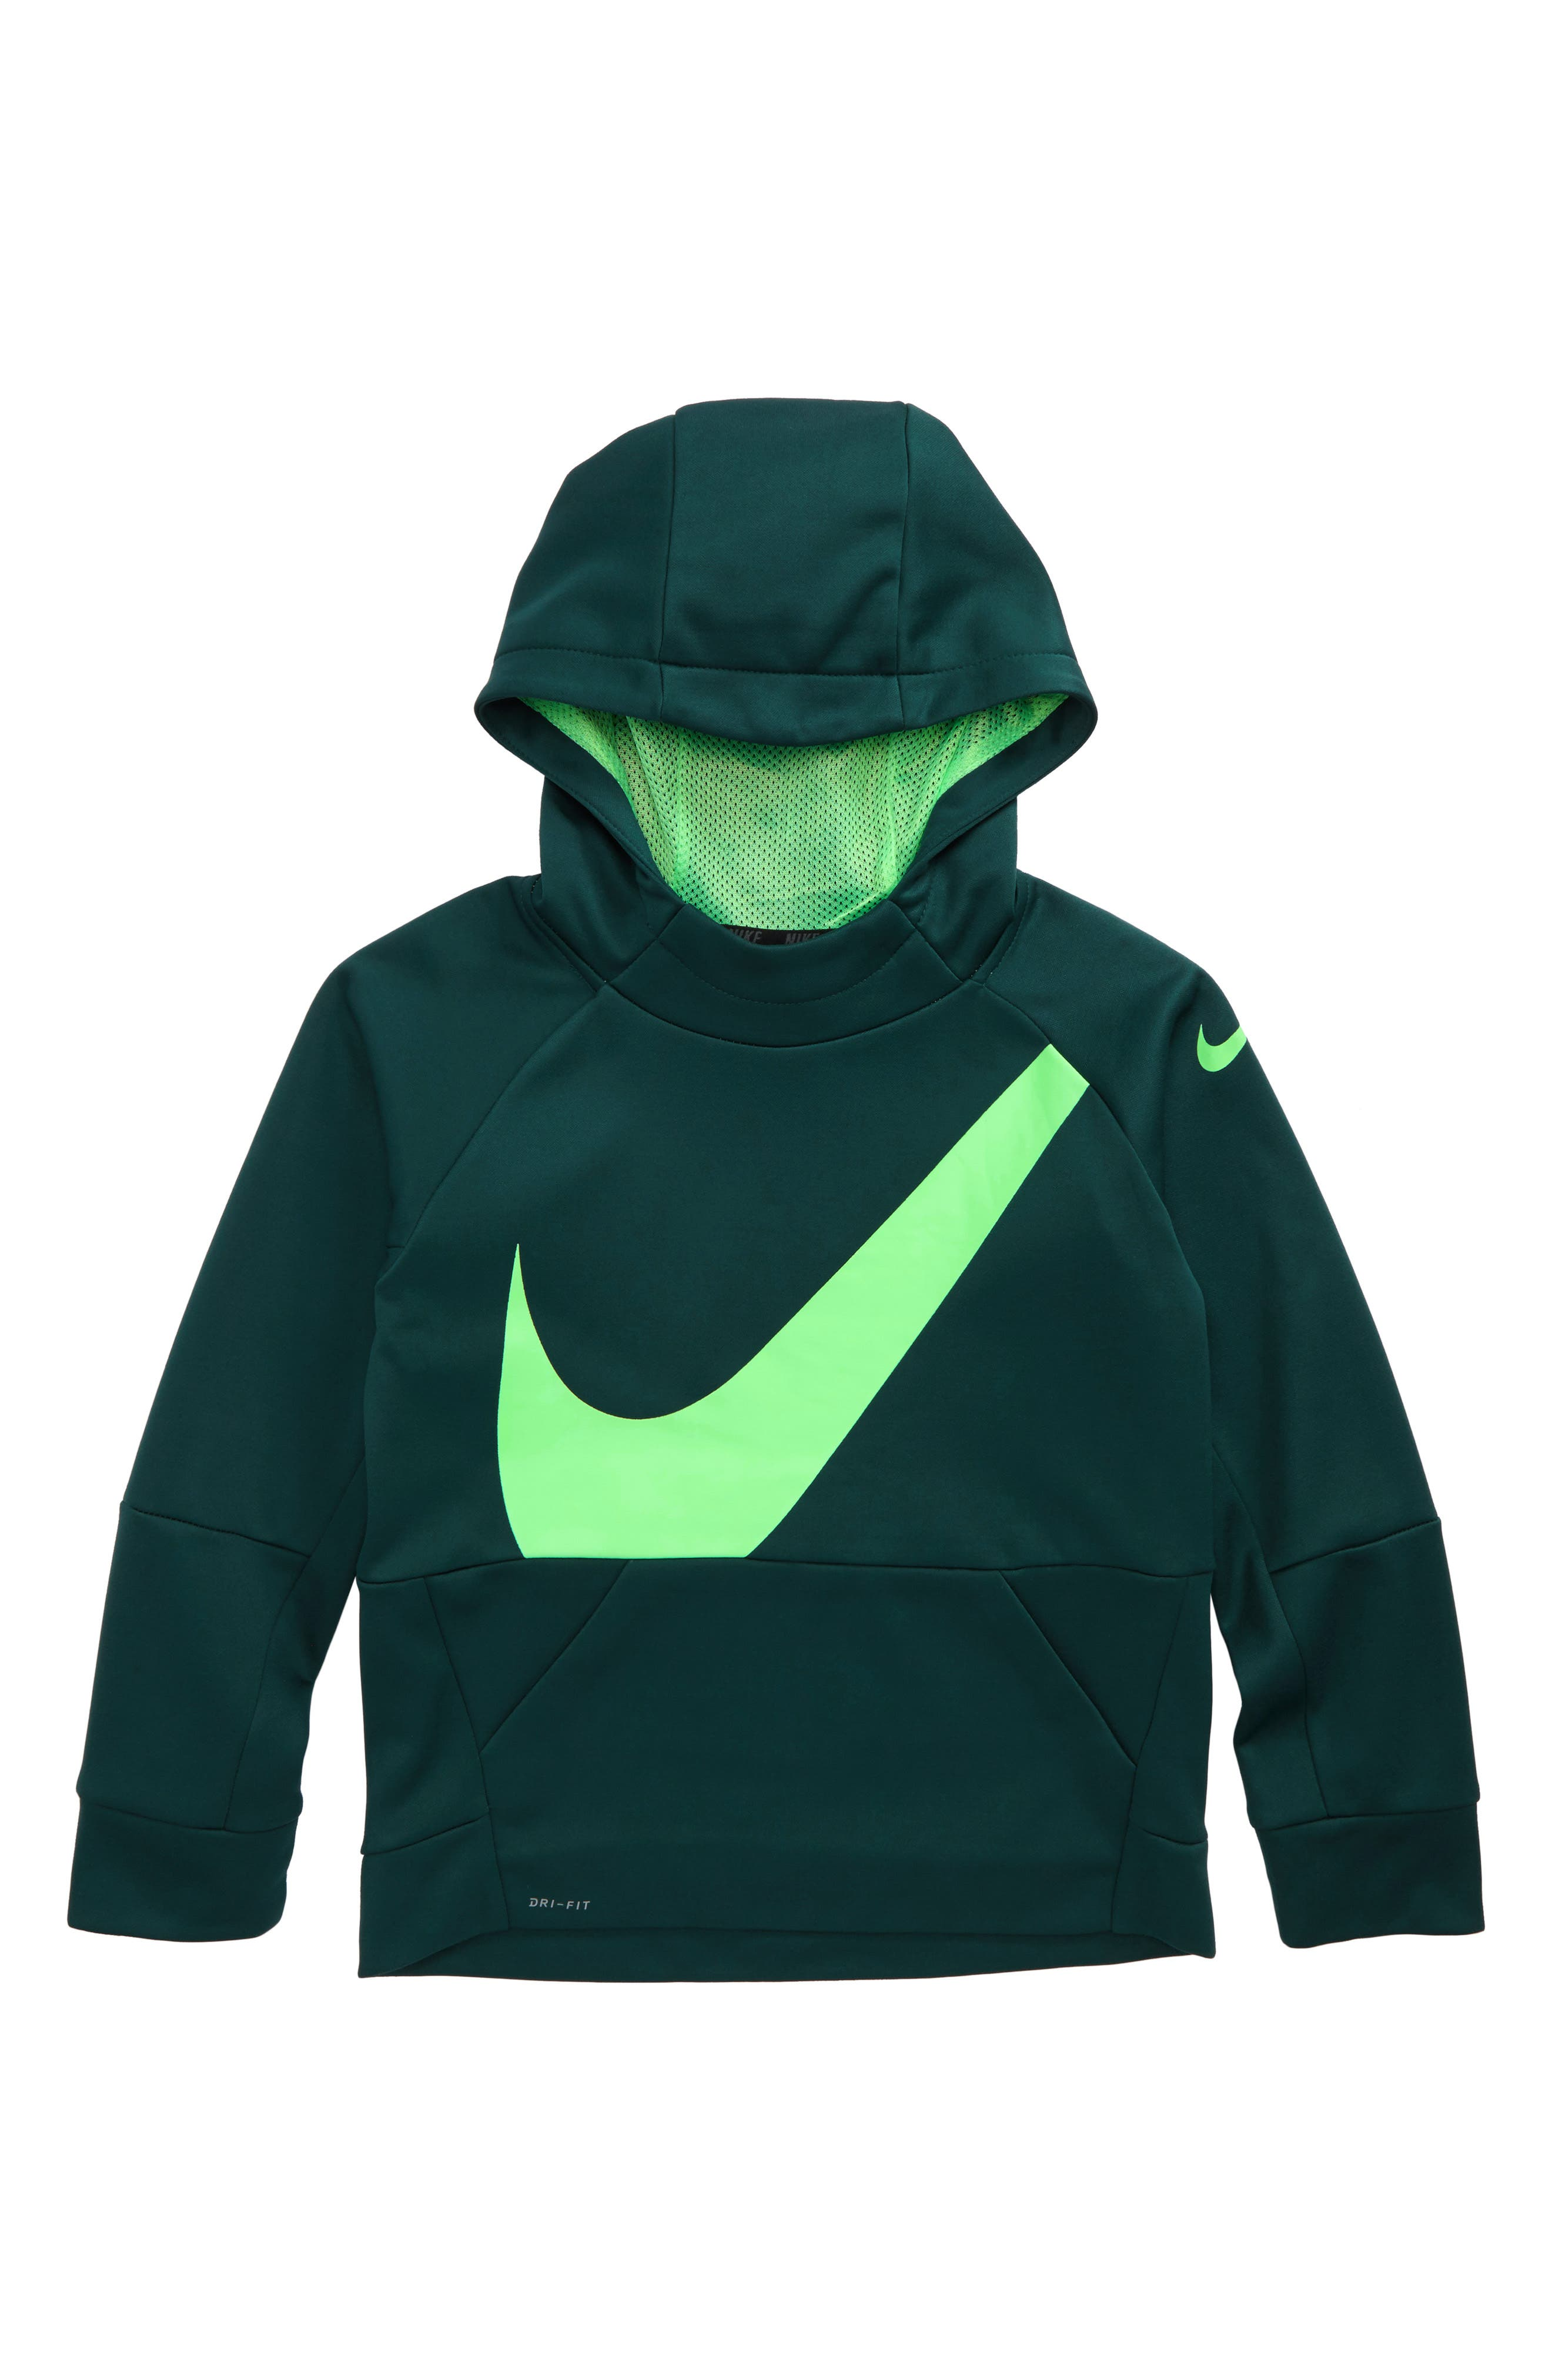 Alternate Image 1 Selected - Nike Therma Dry Swoosh Hoodie (Toddler Boys & Little Boys)